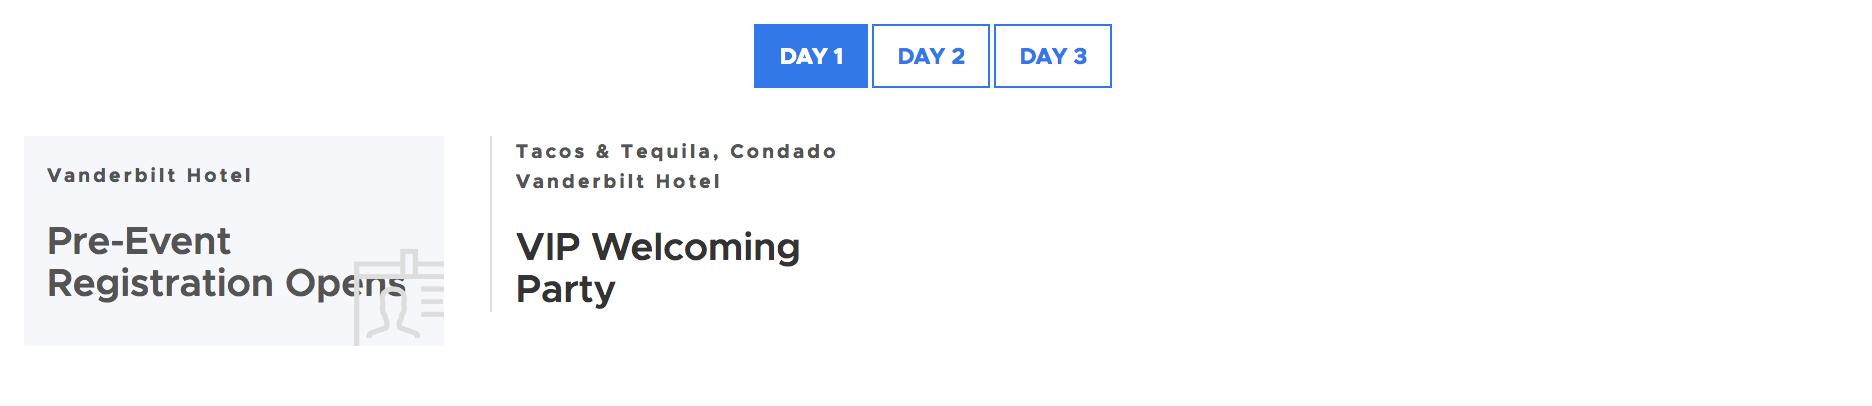 Day 1 Agenda